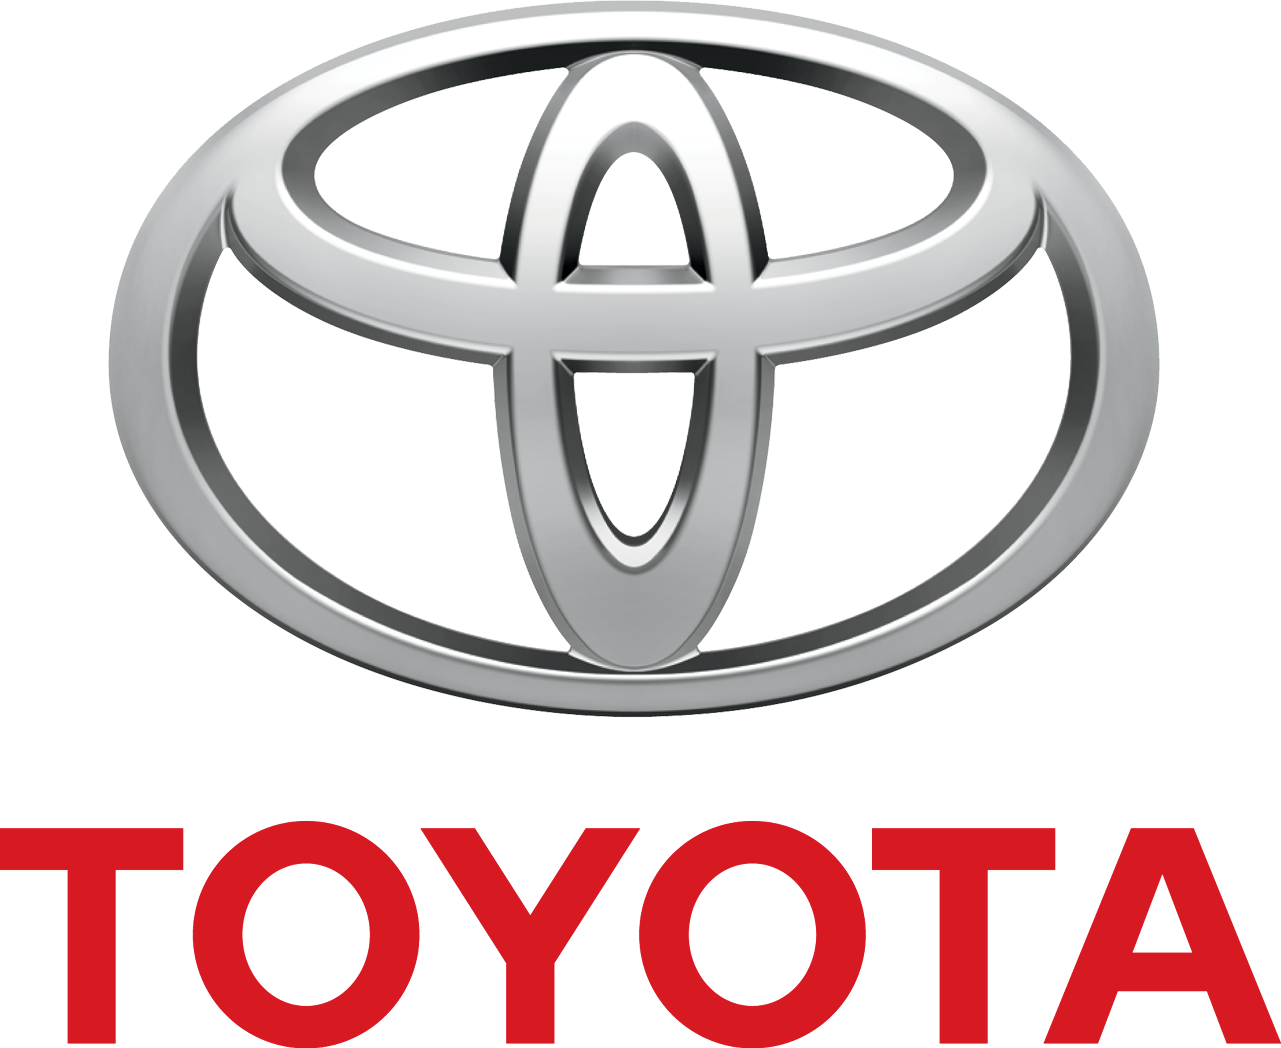 Excalibur Auto Body Works on Toyota